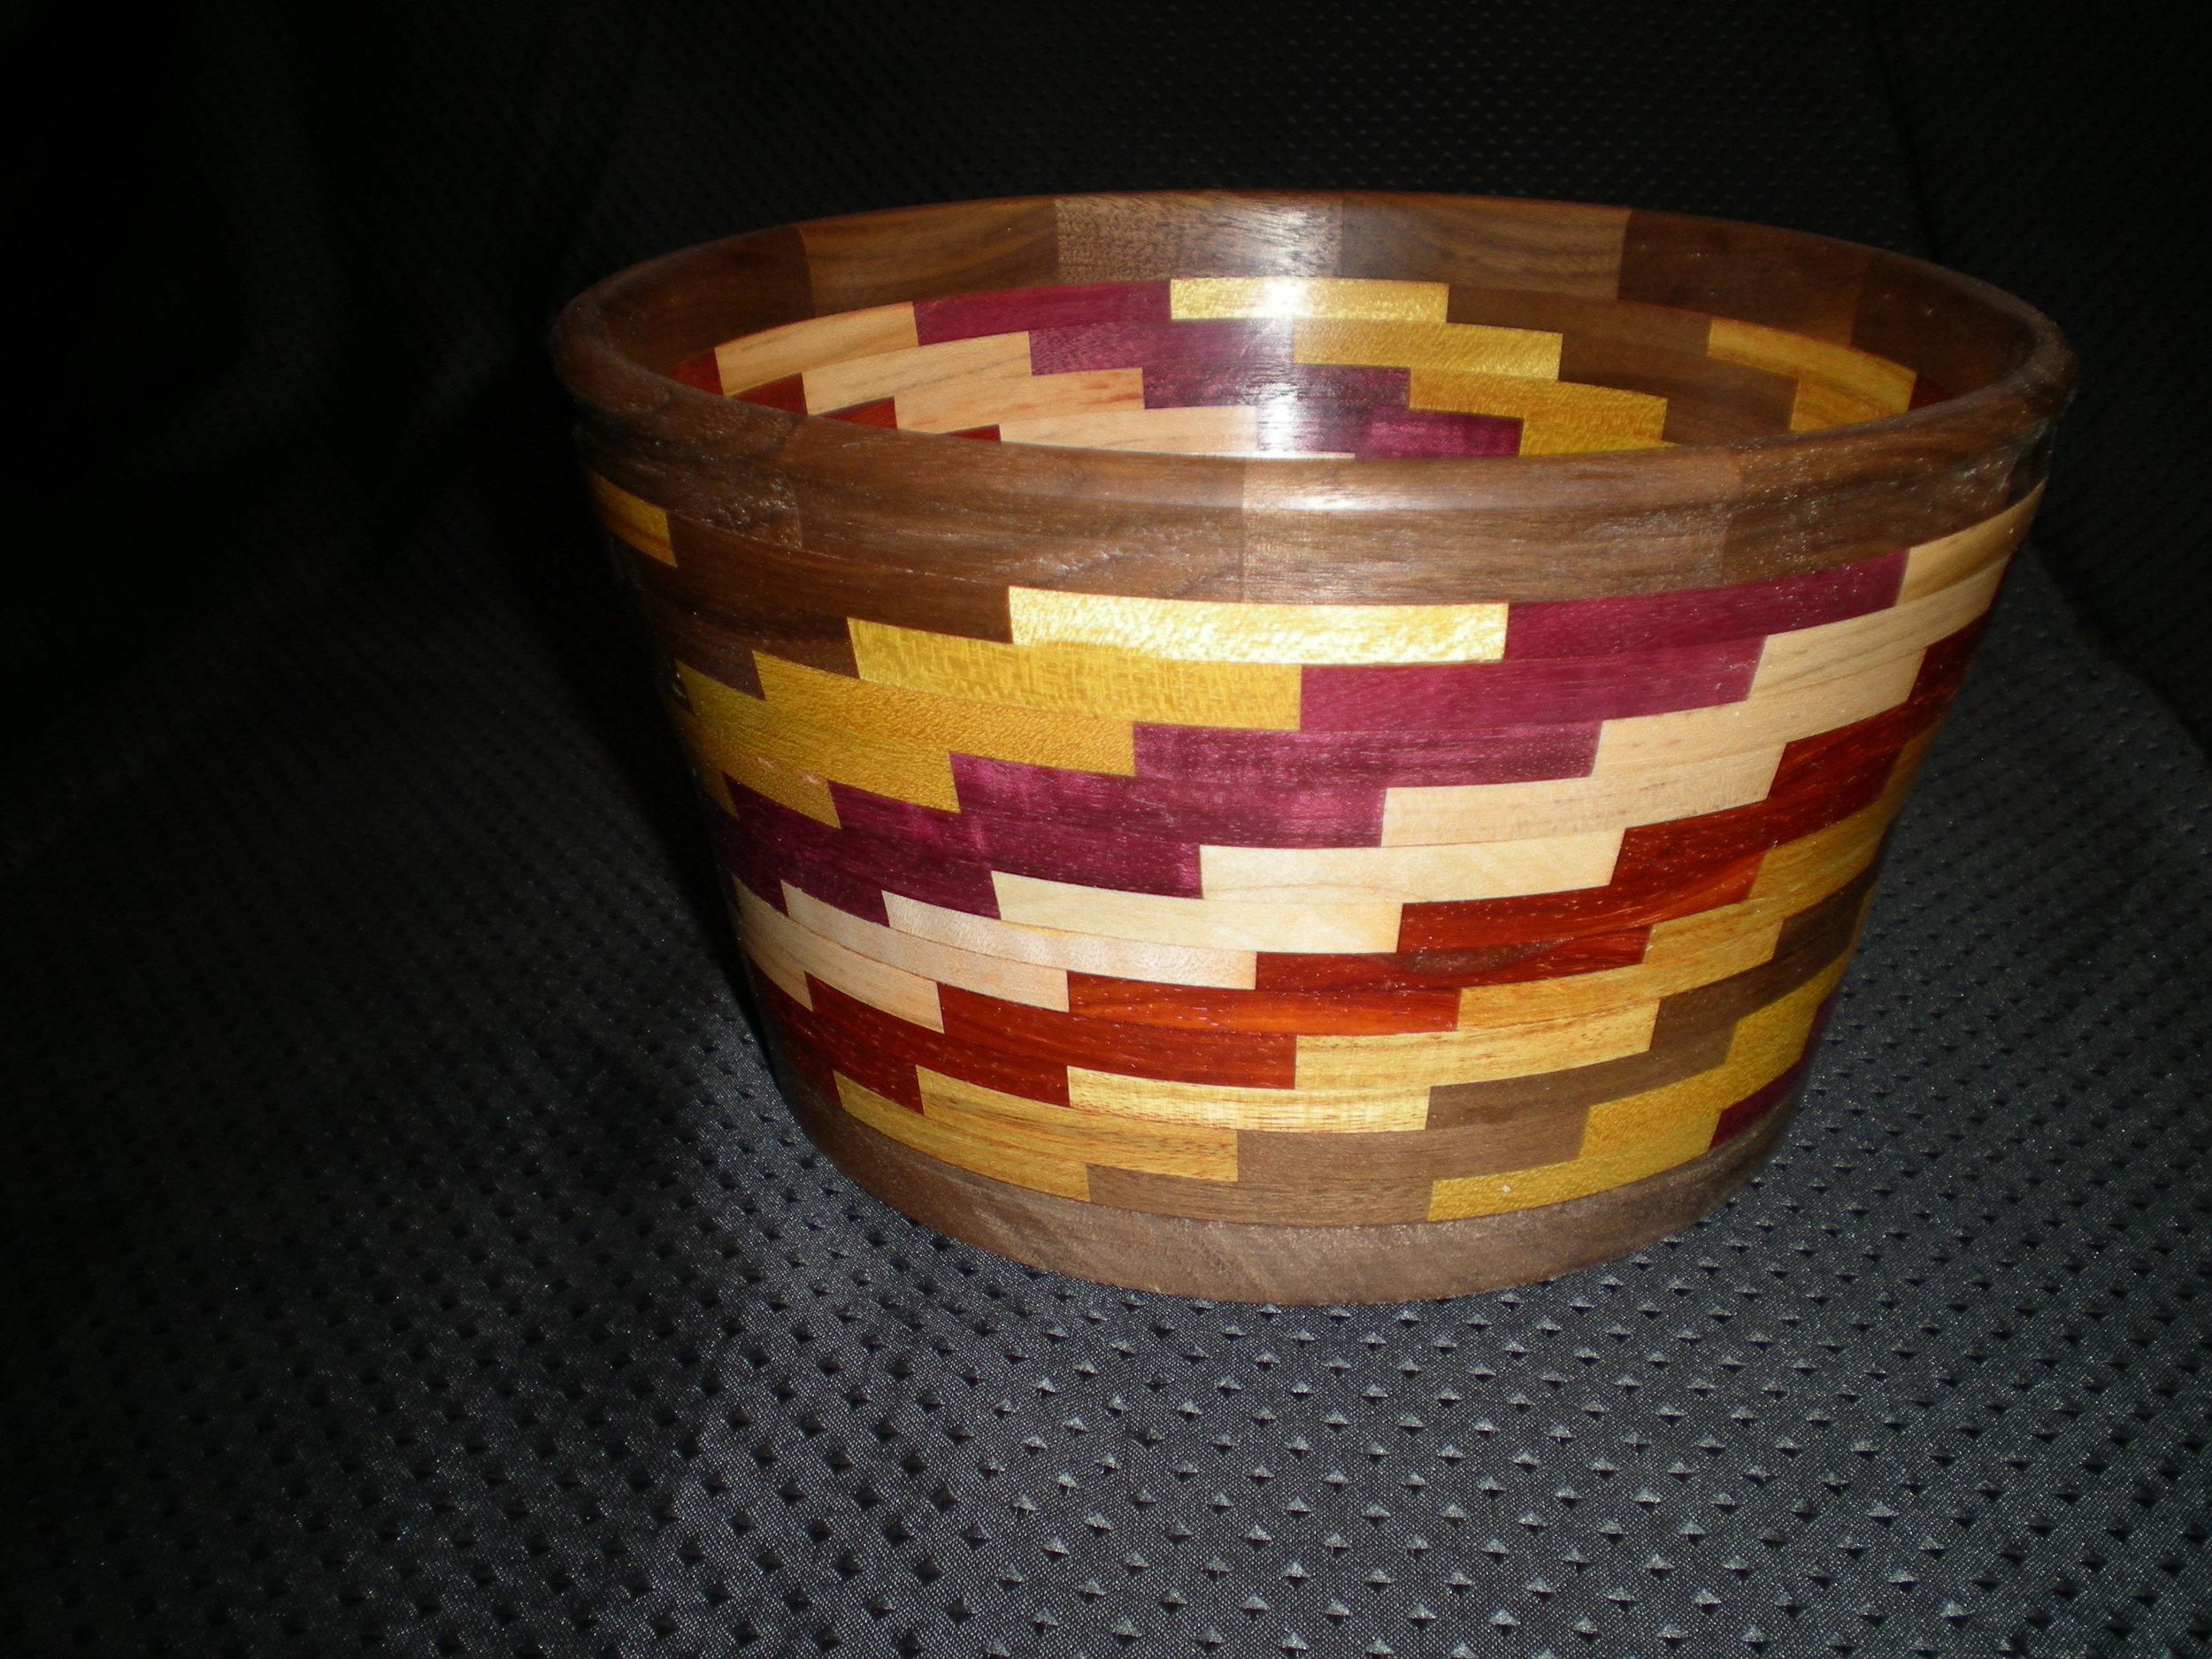 RJC Wood Creations - Bowls (23).JPG